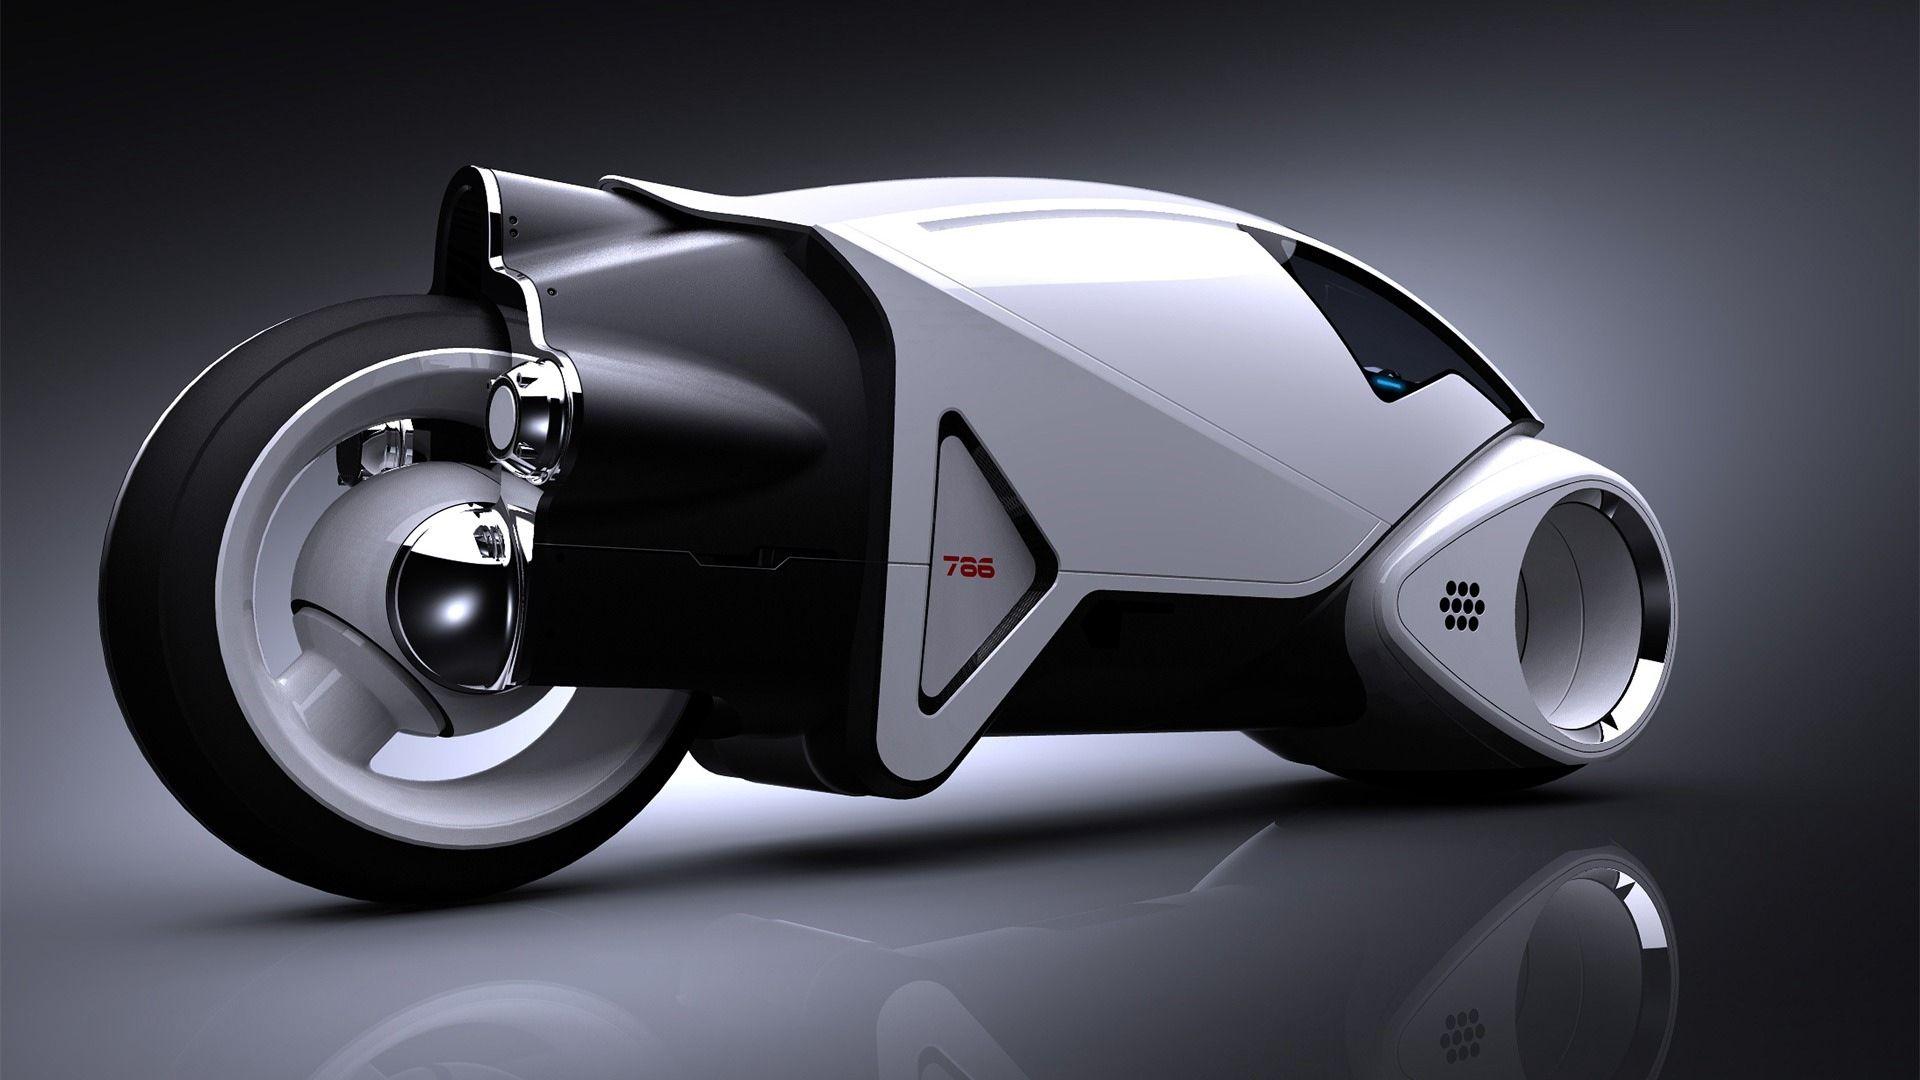 concept prototype bike future x Hd ...